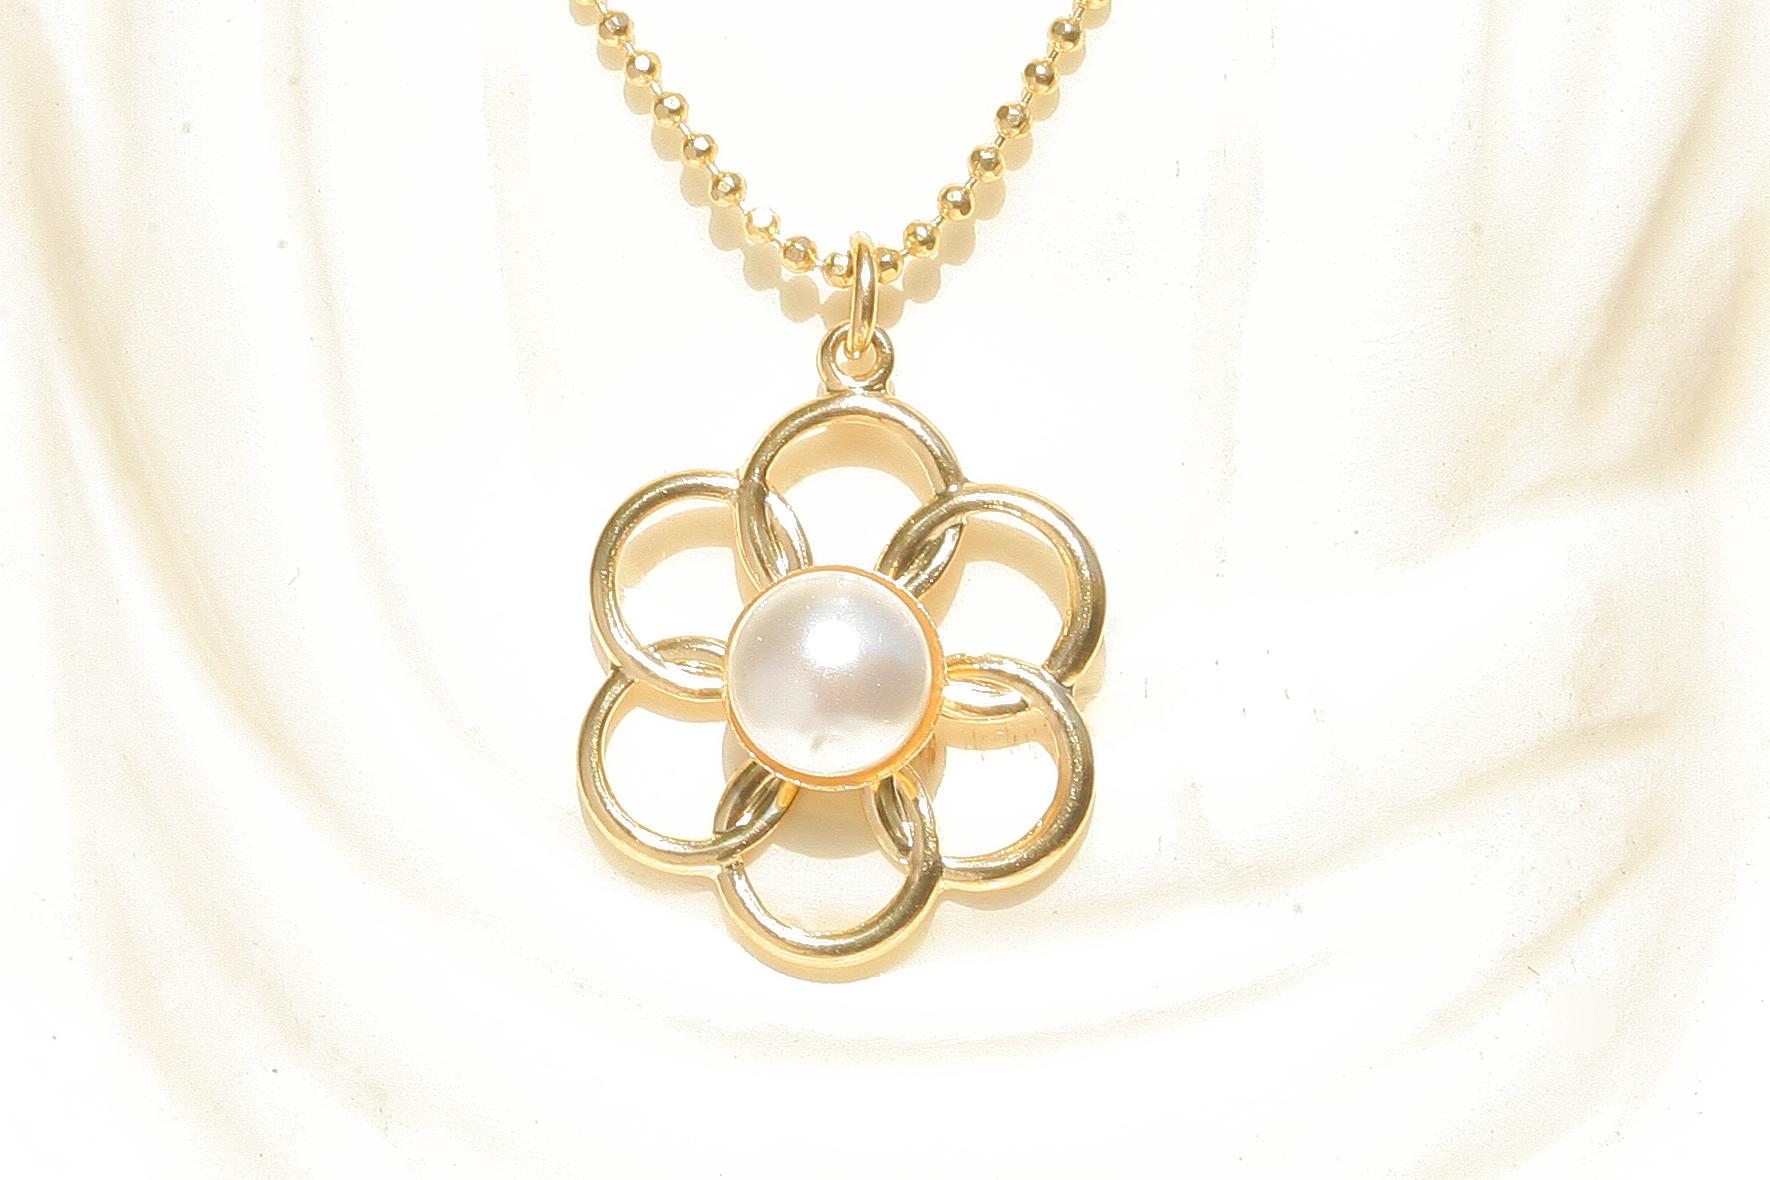 artjany vergoldete Halskette blume mit perle